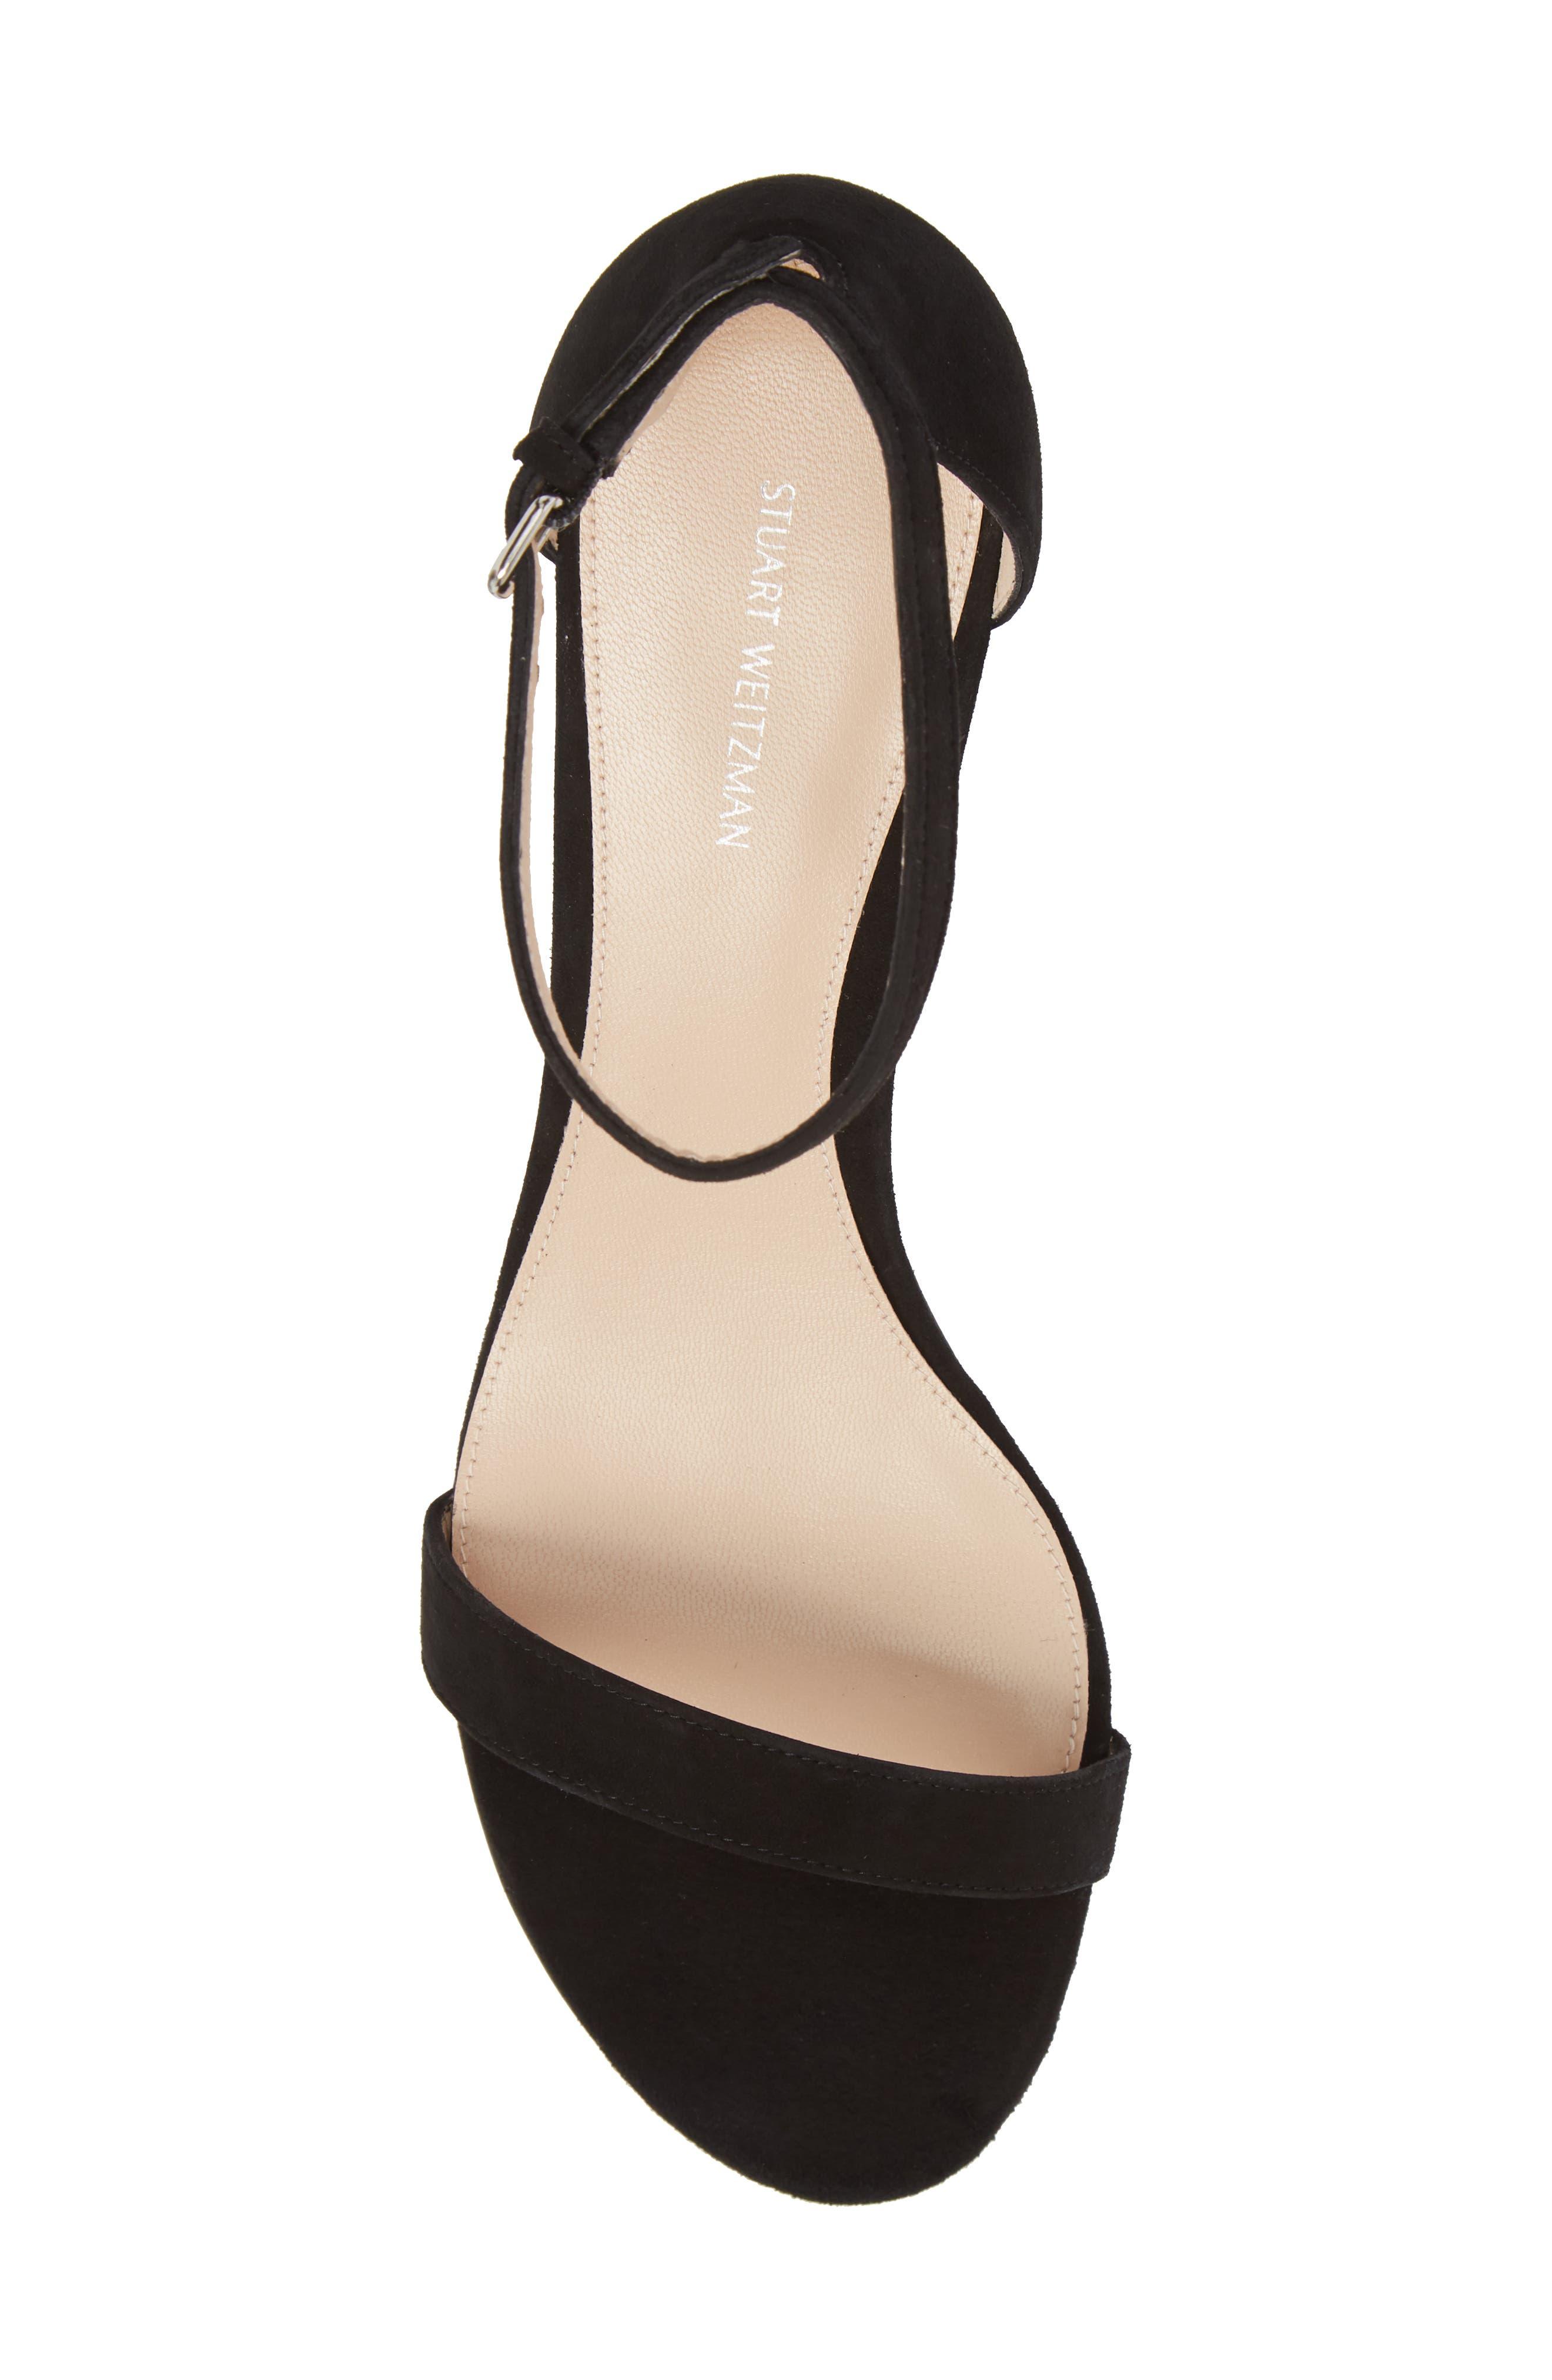 Simple Ankle Strap Sandal,                             Alternate thumbnail 5, color,                             BLACK SUEDE